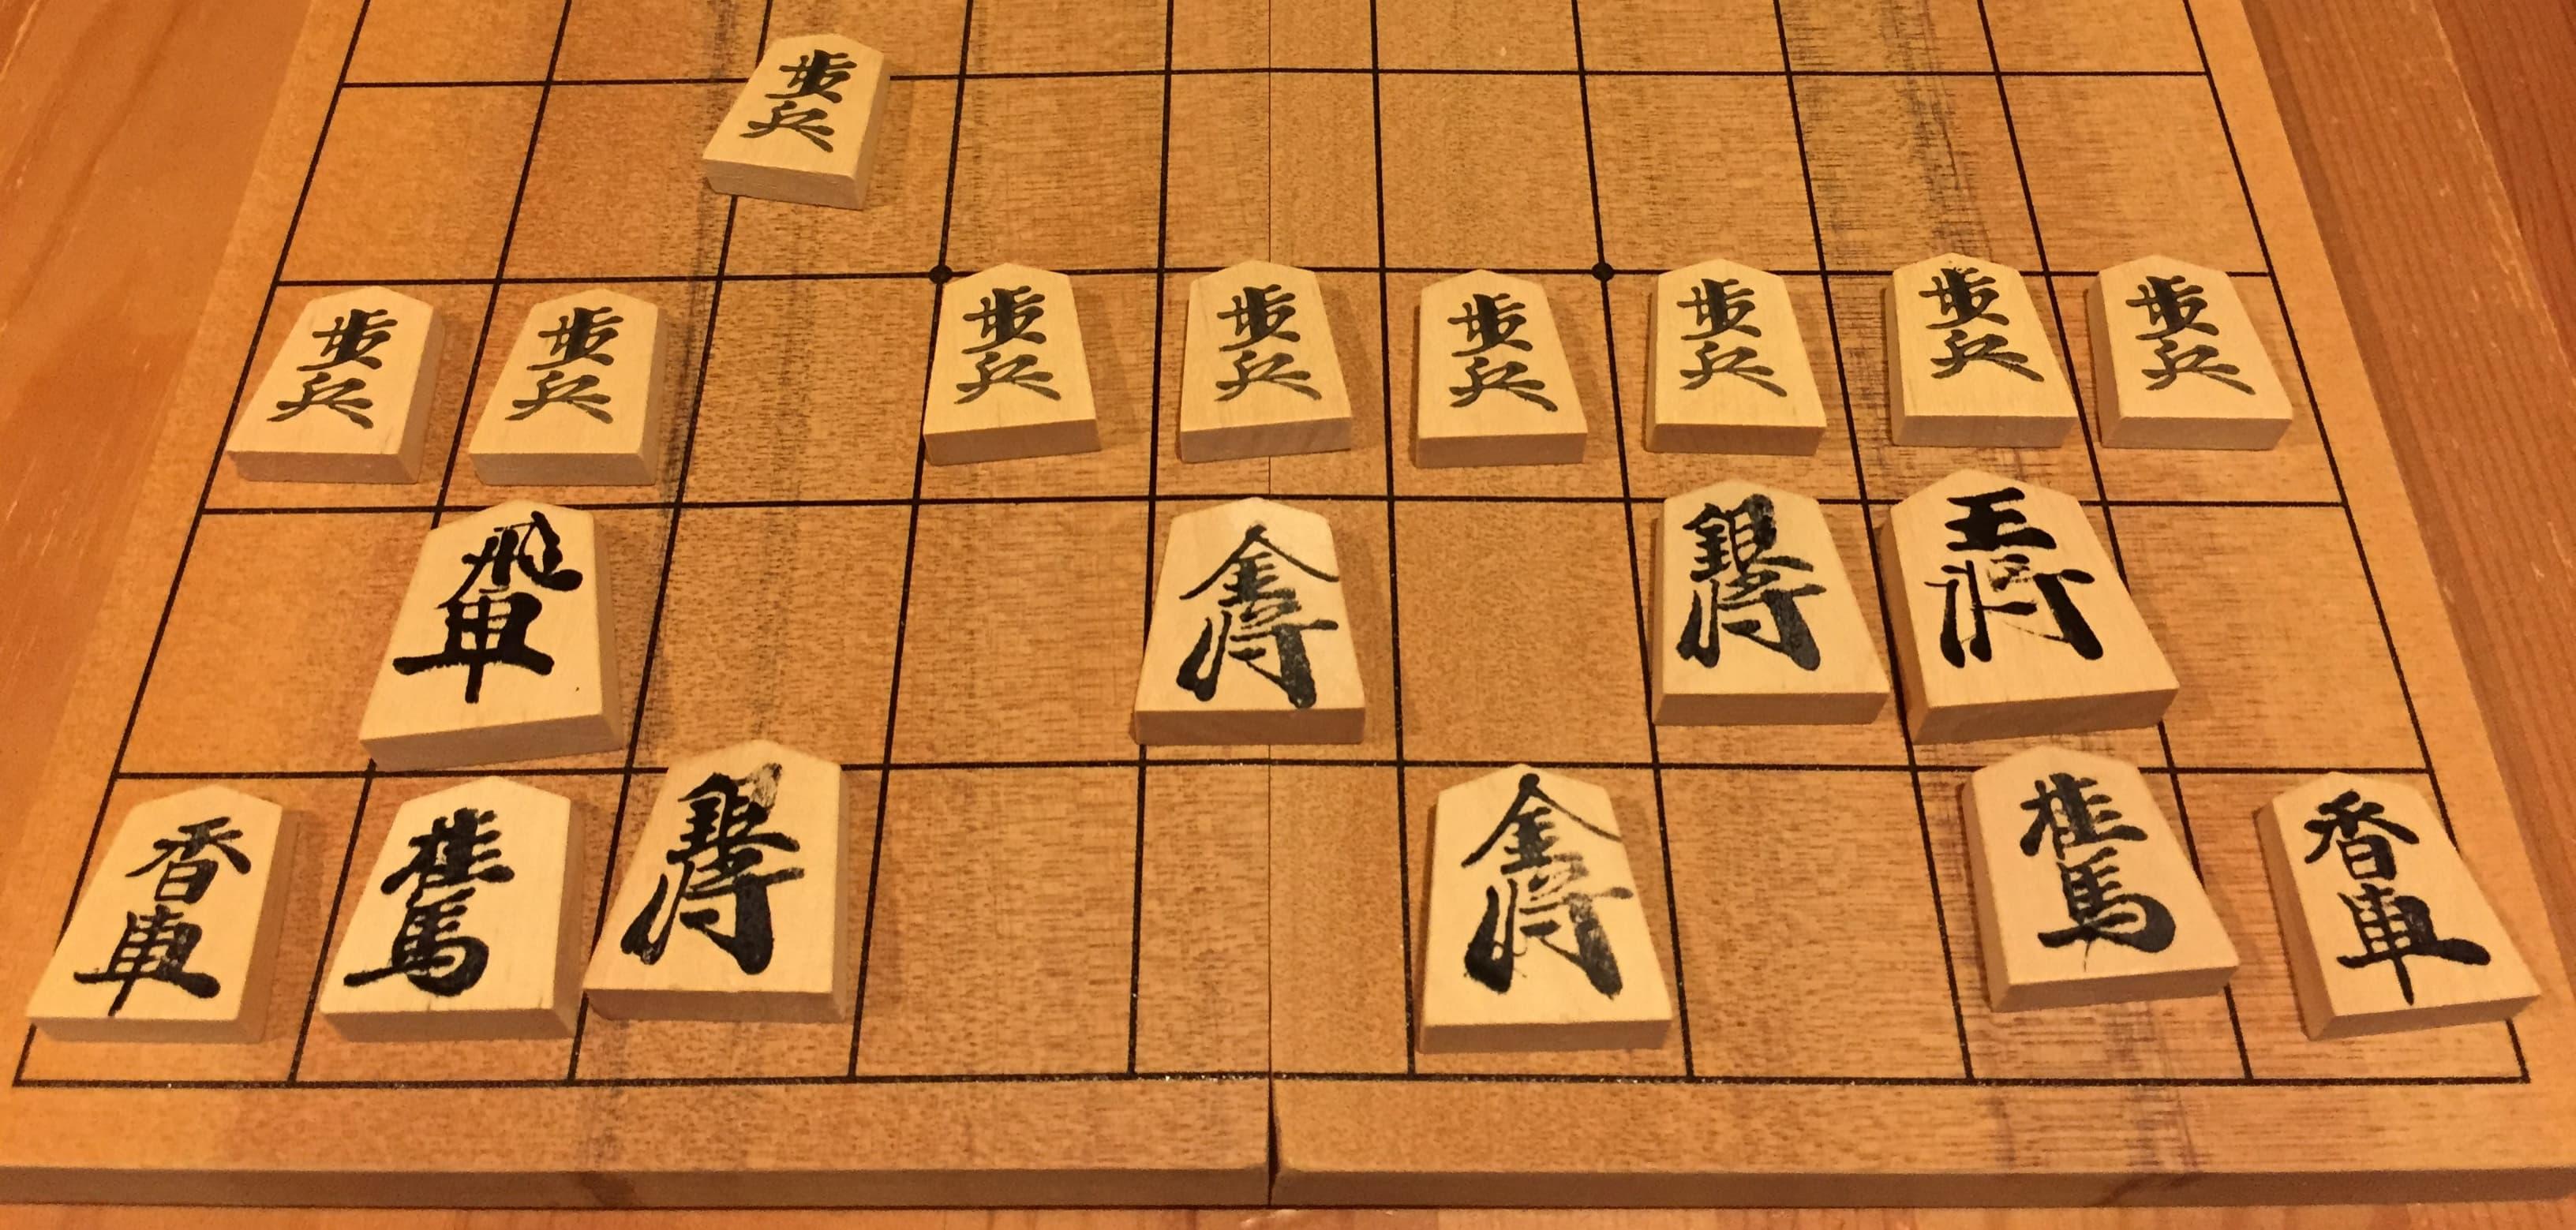 Shogi, or Japanese chess (Photo: geraldford/Flickr)